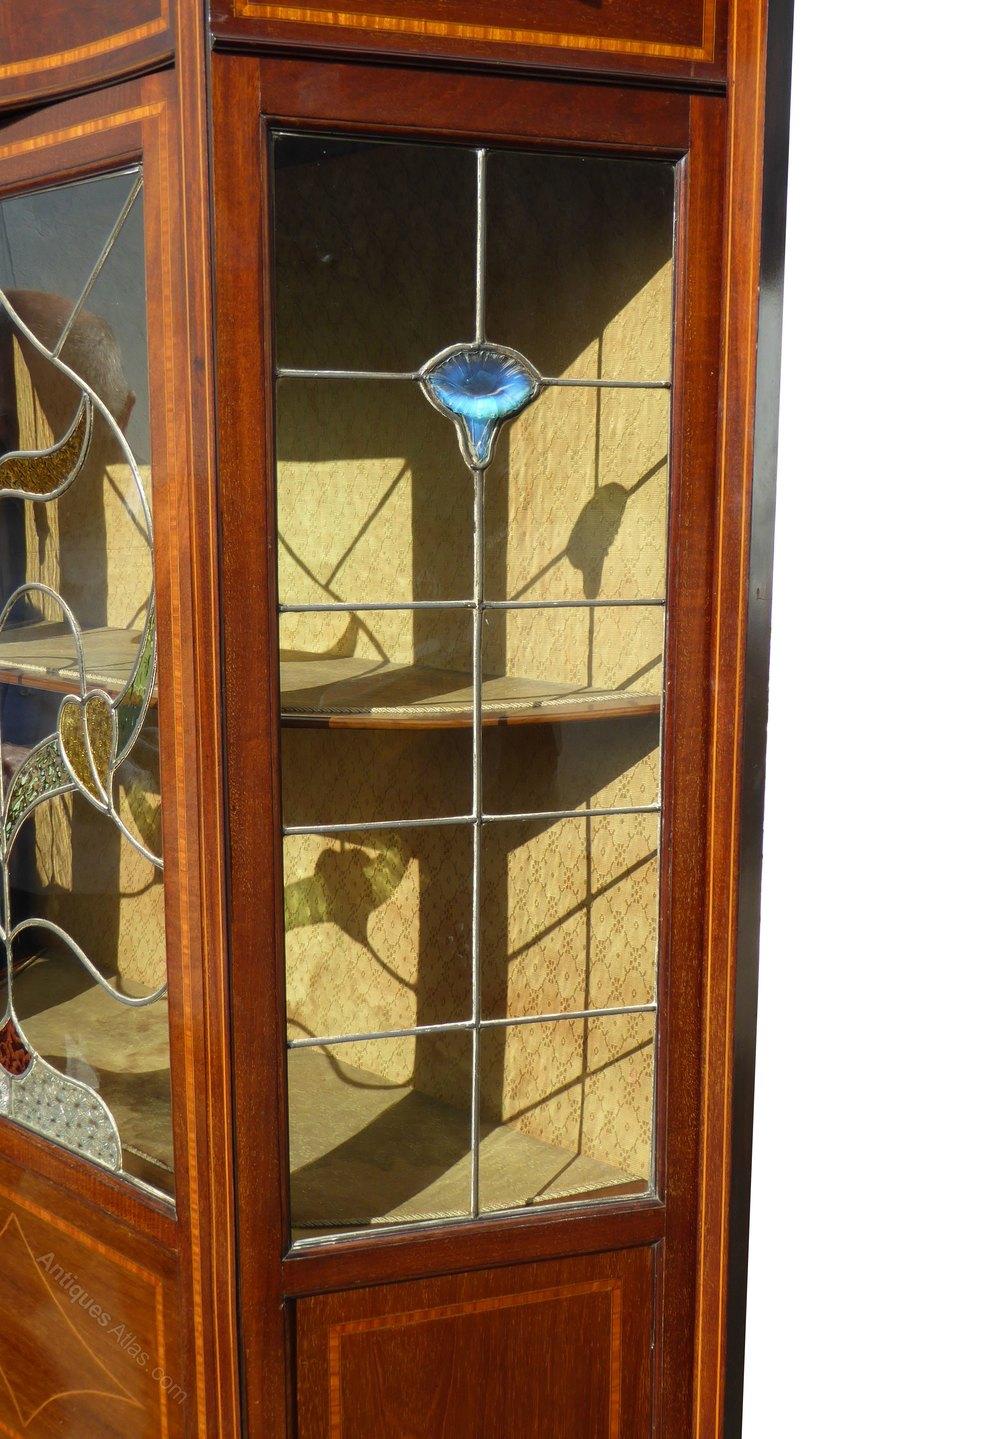 Edwardian Art Nouveau Leaded Glass Display Cabinet